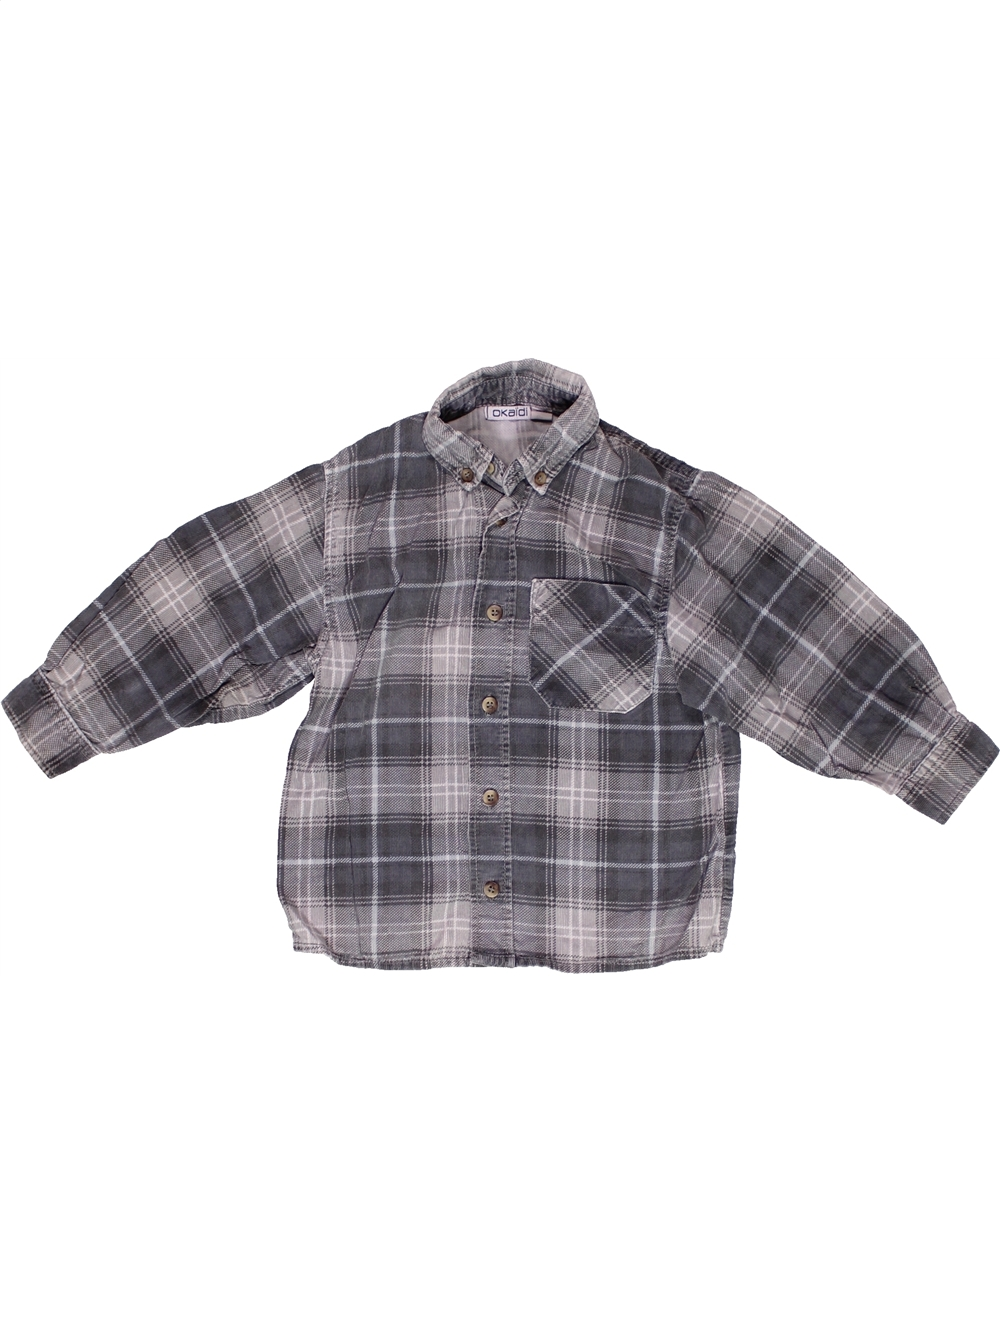 Chemise-manches-longues-enfant-garA-on-OKAIDI-2-ans-gris-hiver-vA-tement-bA-bA